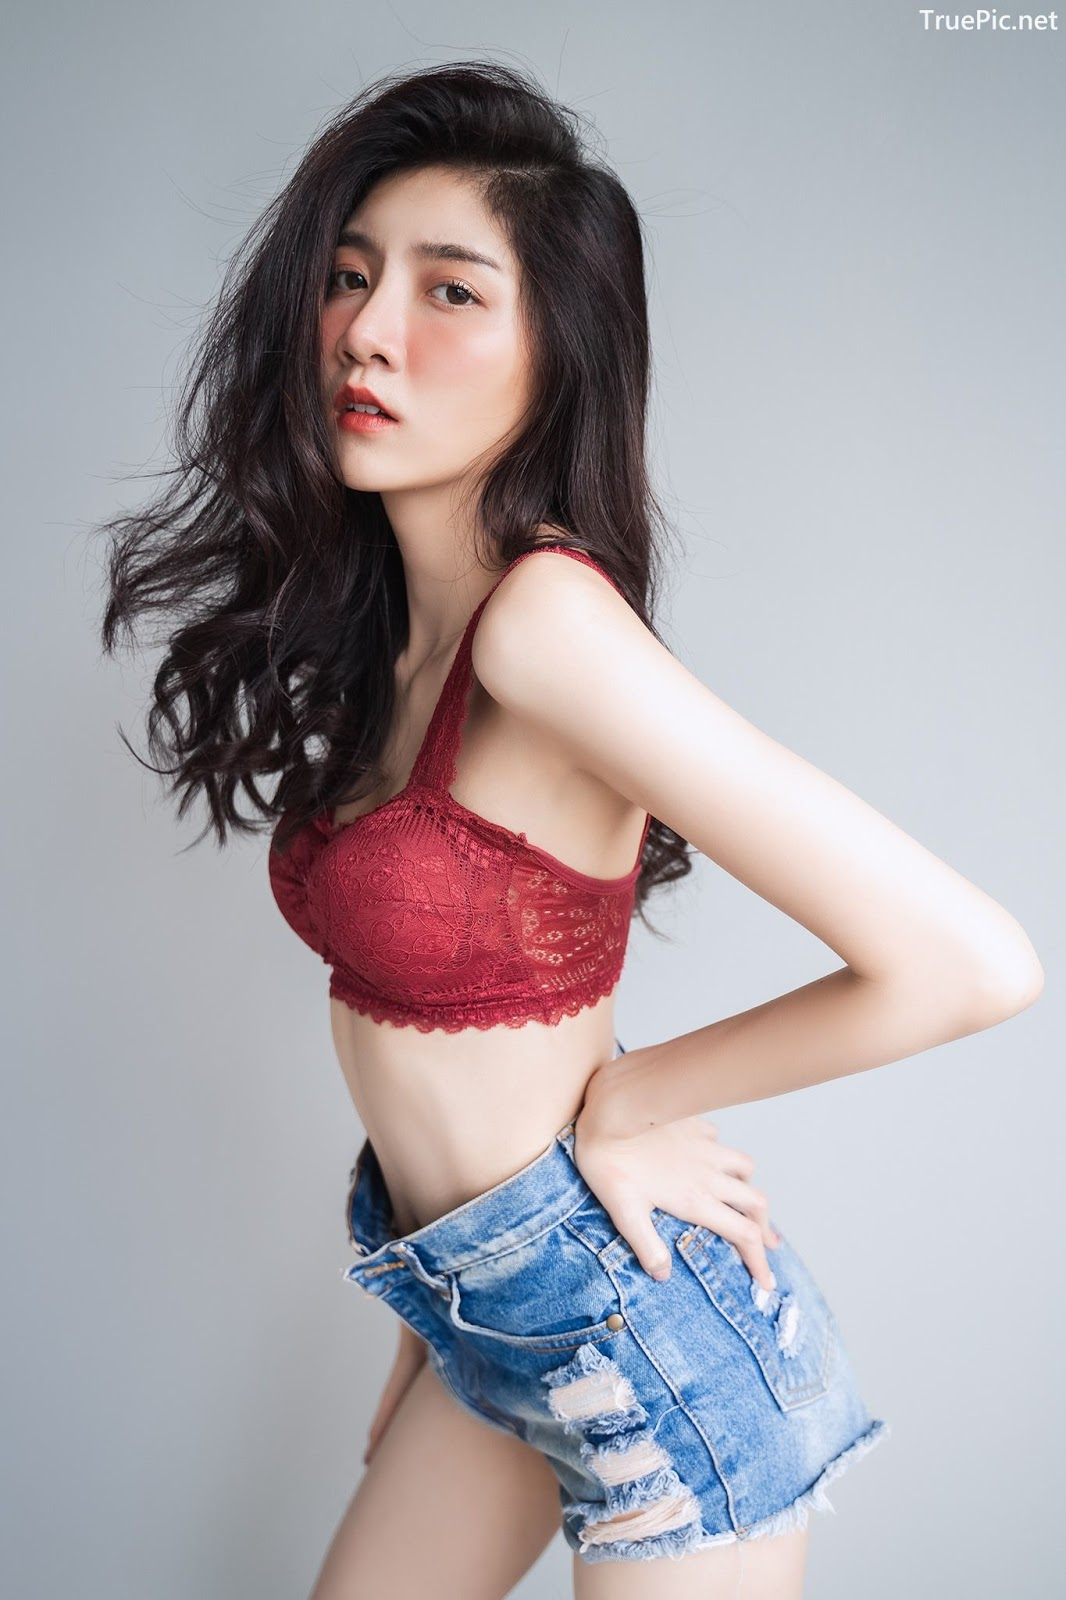 Image Thailand Model - Sasi Ngiunwan - Strawberry Cake - TruePic.net - Picture-7